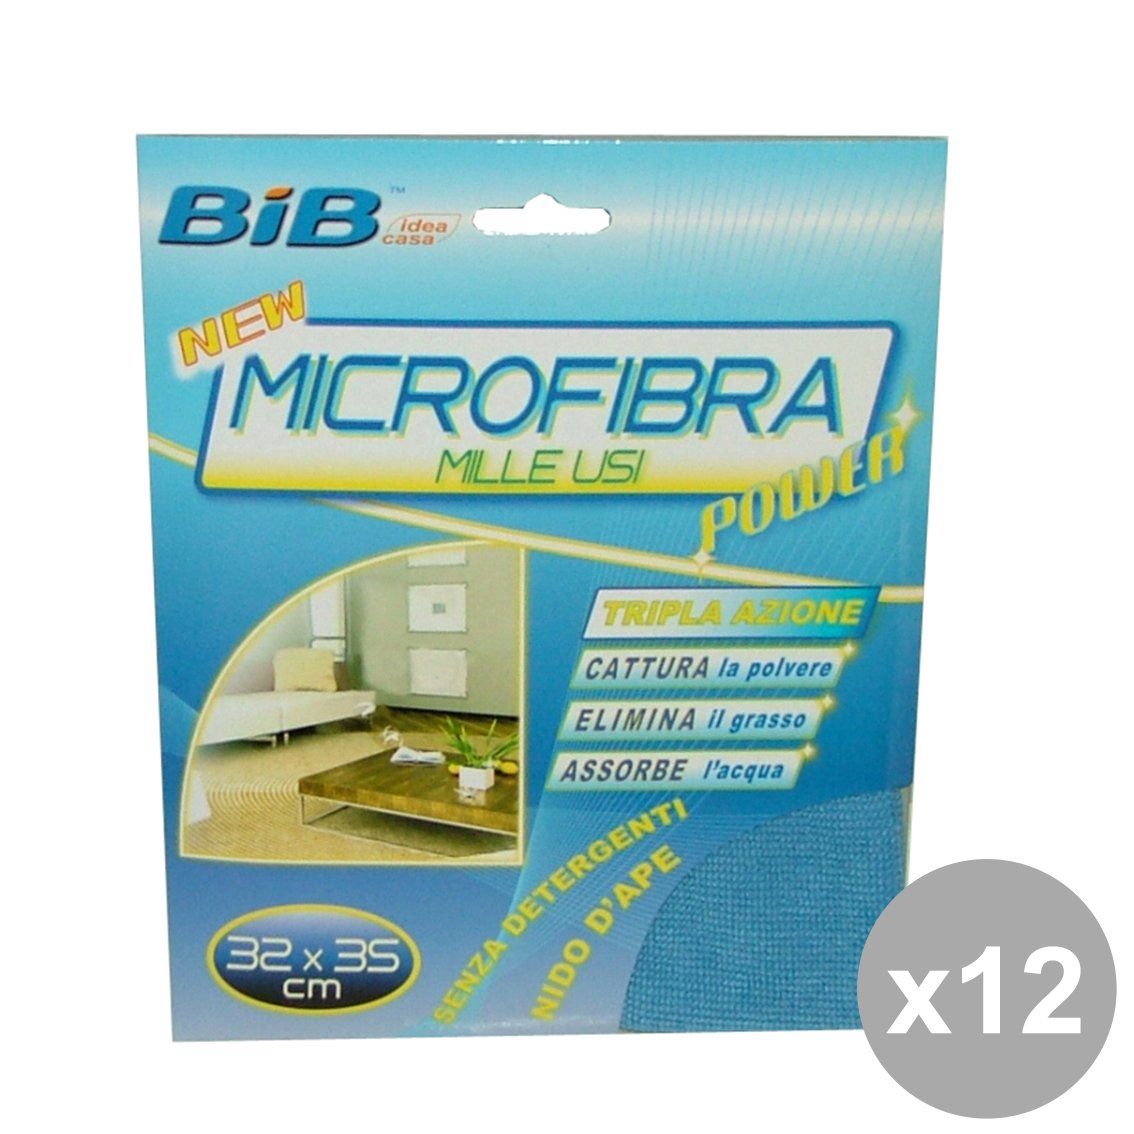 Set 12 BIB Panno Milleusi Microfibra 32X35 Cm. Attrezzi Pulizie